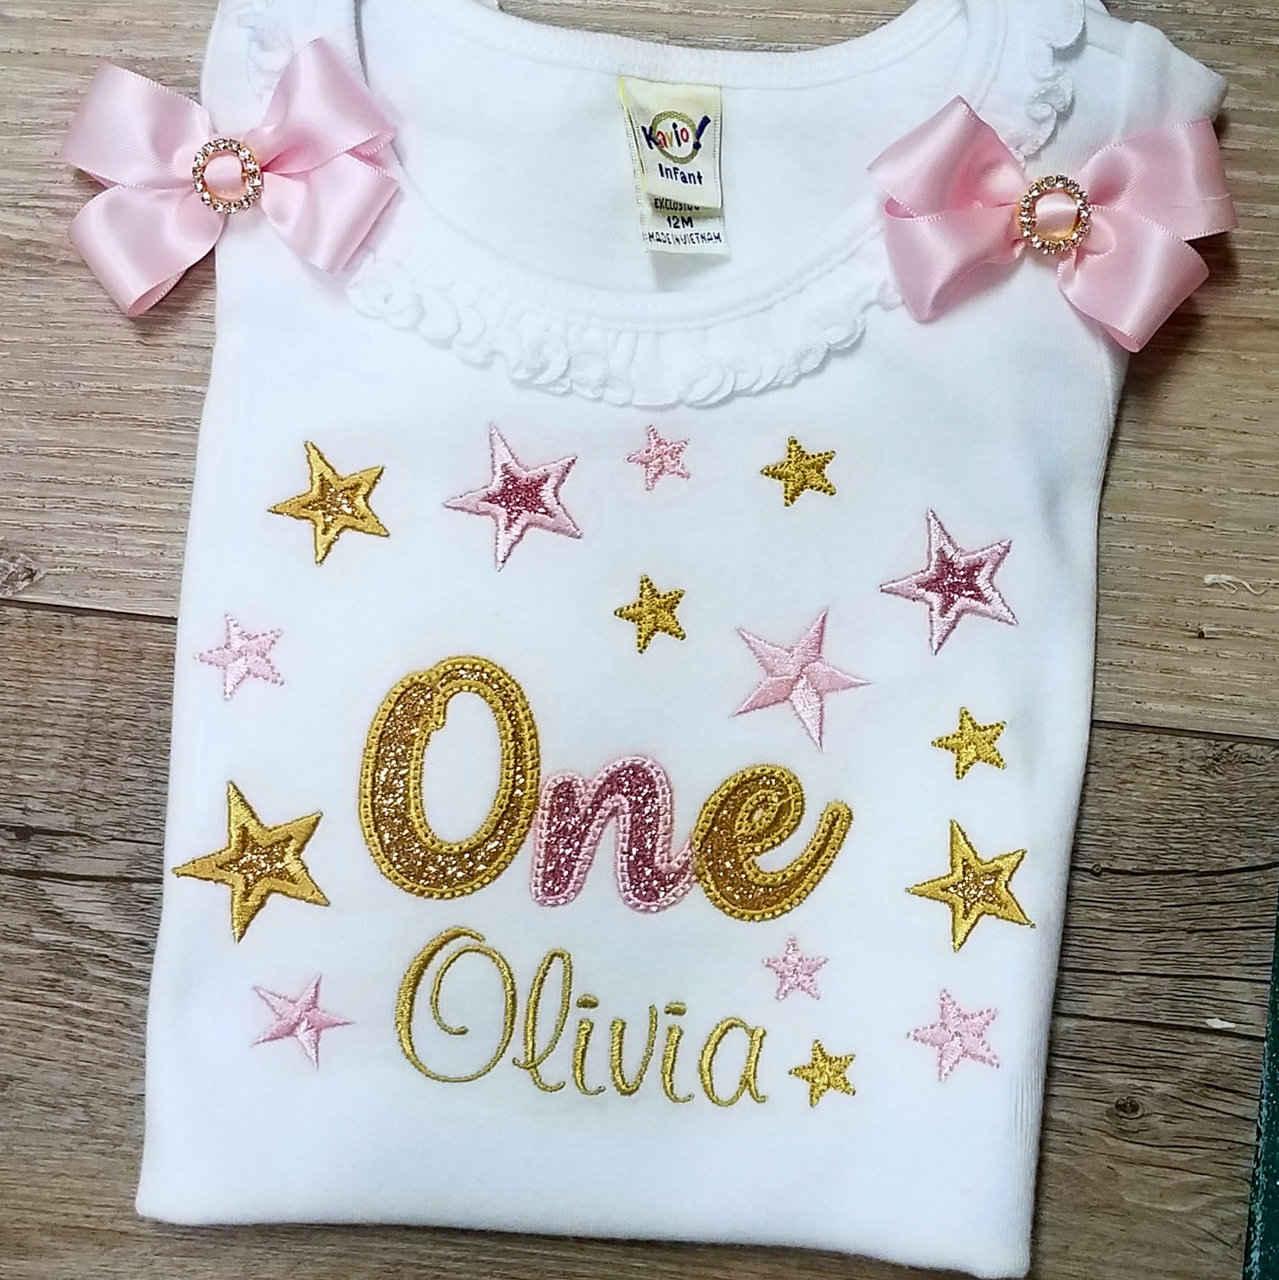 personalized birthday shirt 1st birthday shirt sparkle one birthday shirt with stars, Glitter birthday custom made personalized shirt